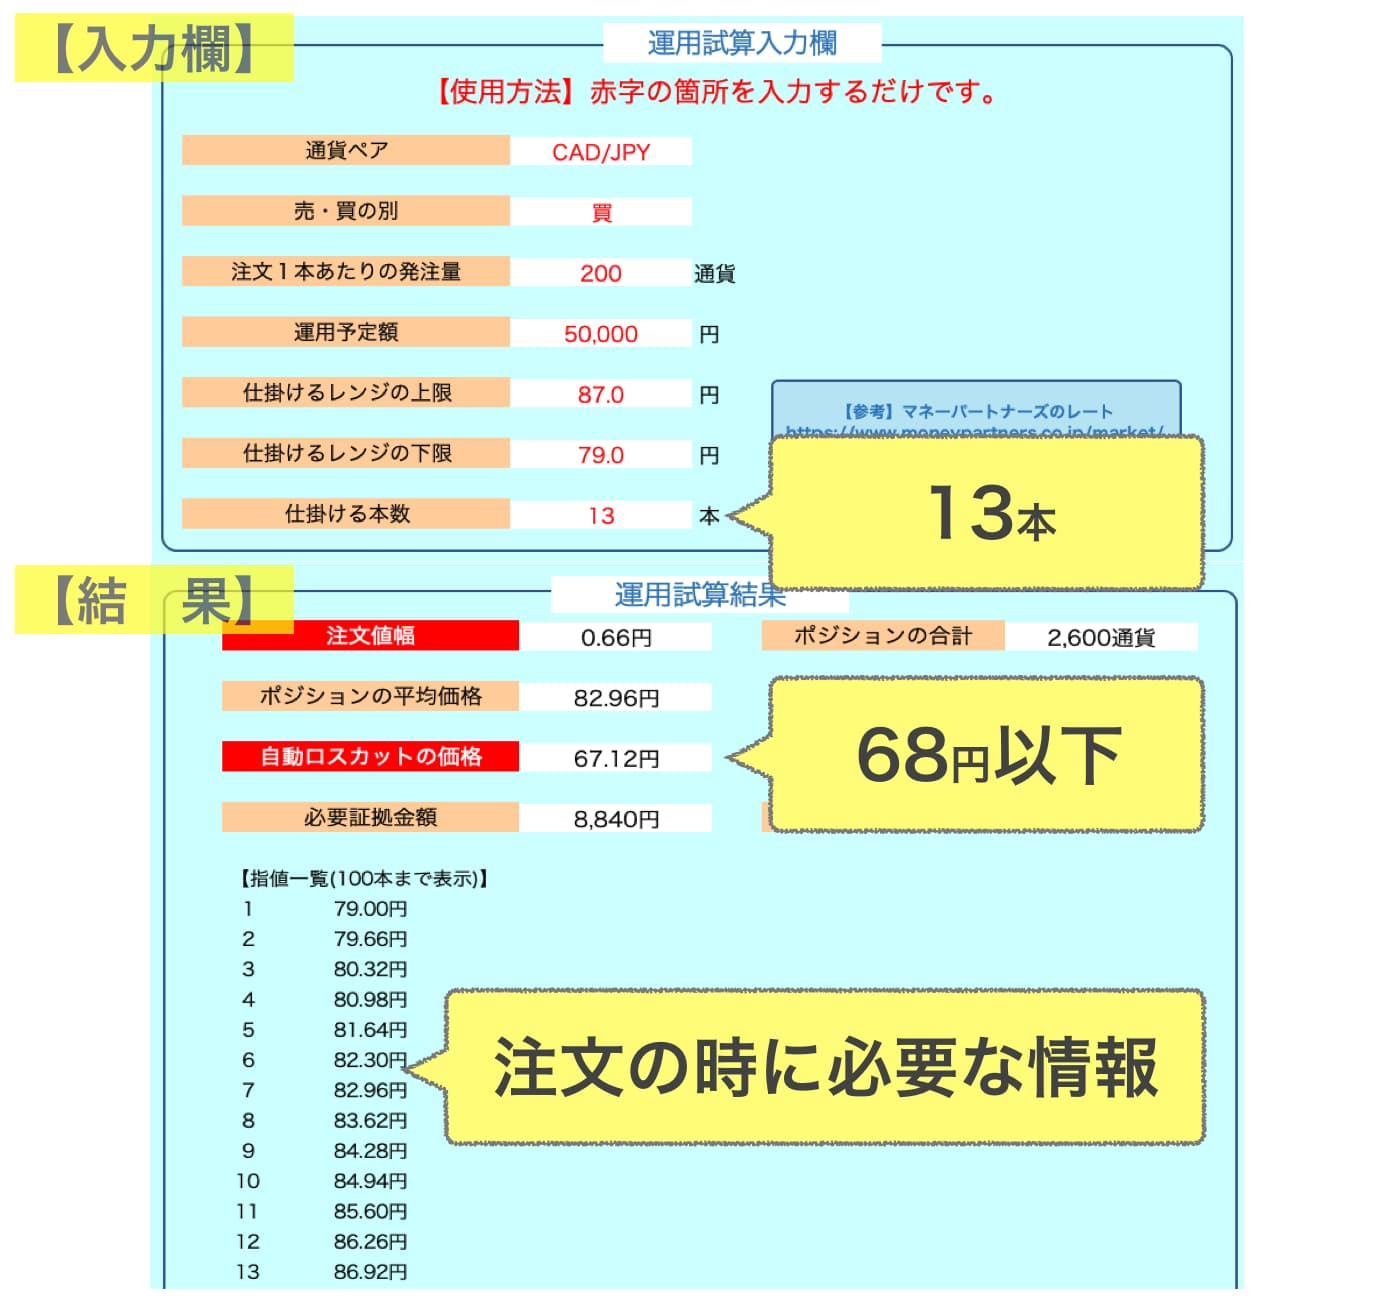 運用試算表の結果(CADJPY)